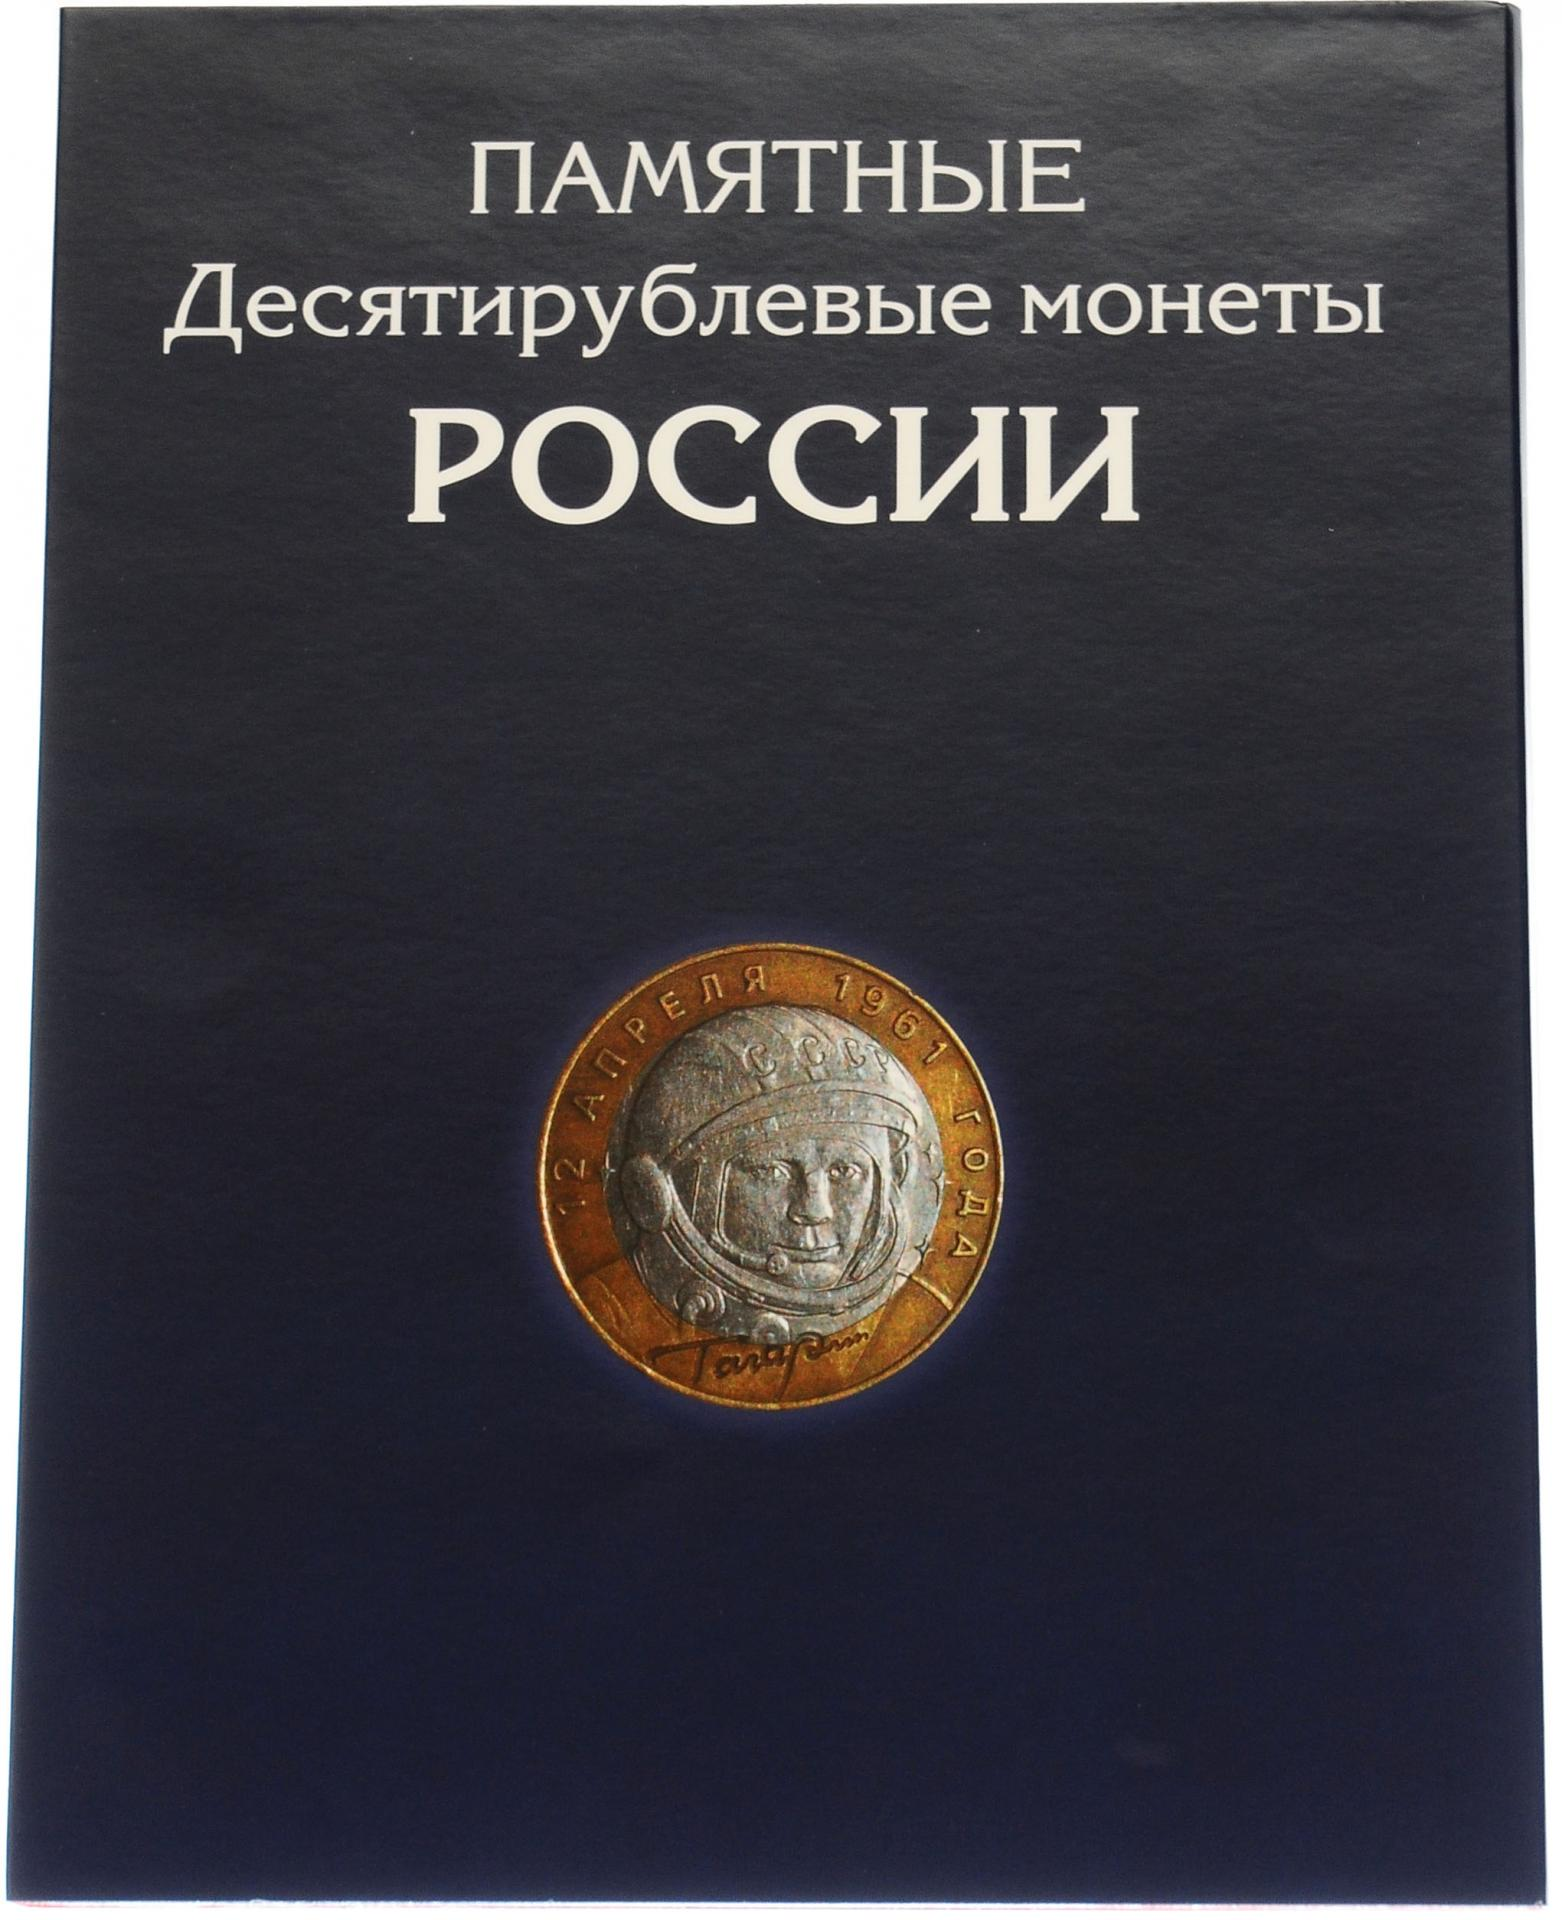 памятные монеты 2 евро 2016 года